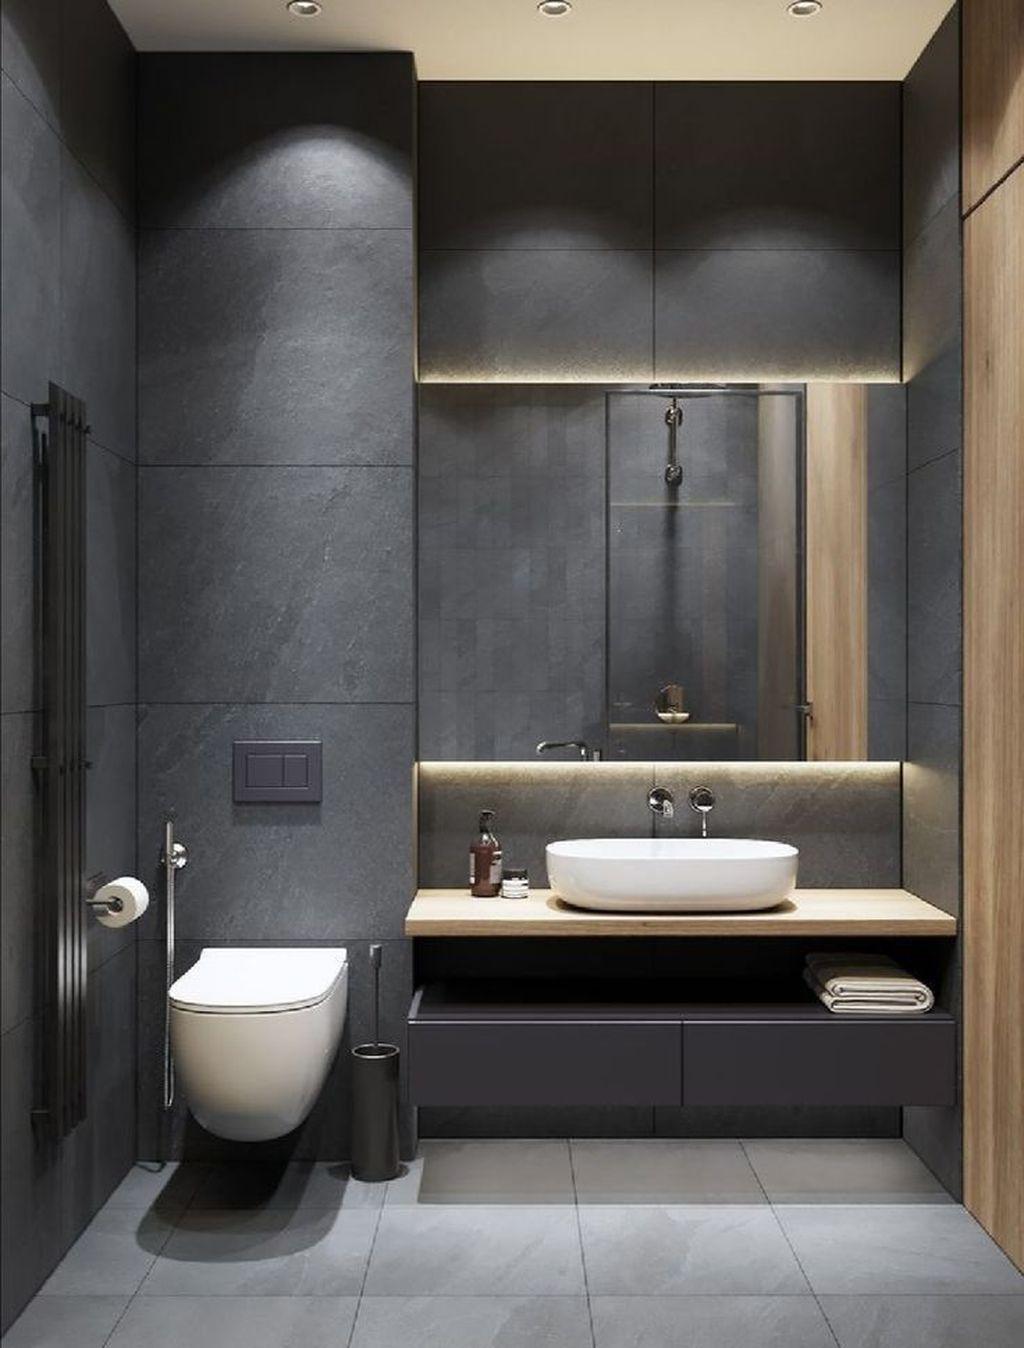 36 Nice Small Bathroom Design Ideas That You Should Copy Trendehouse Washroom Design Minimalist Bathroom Design Restroom Design